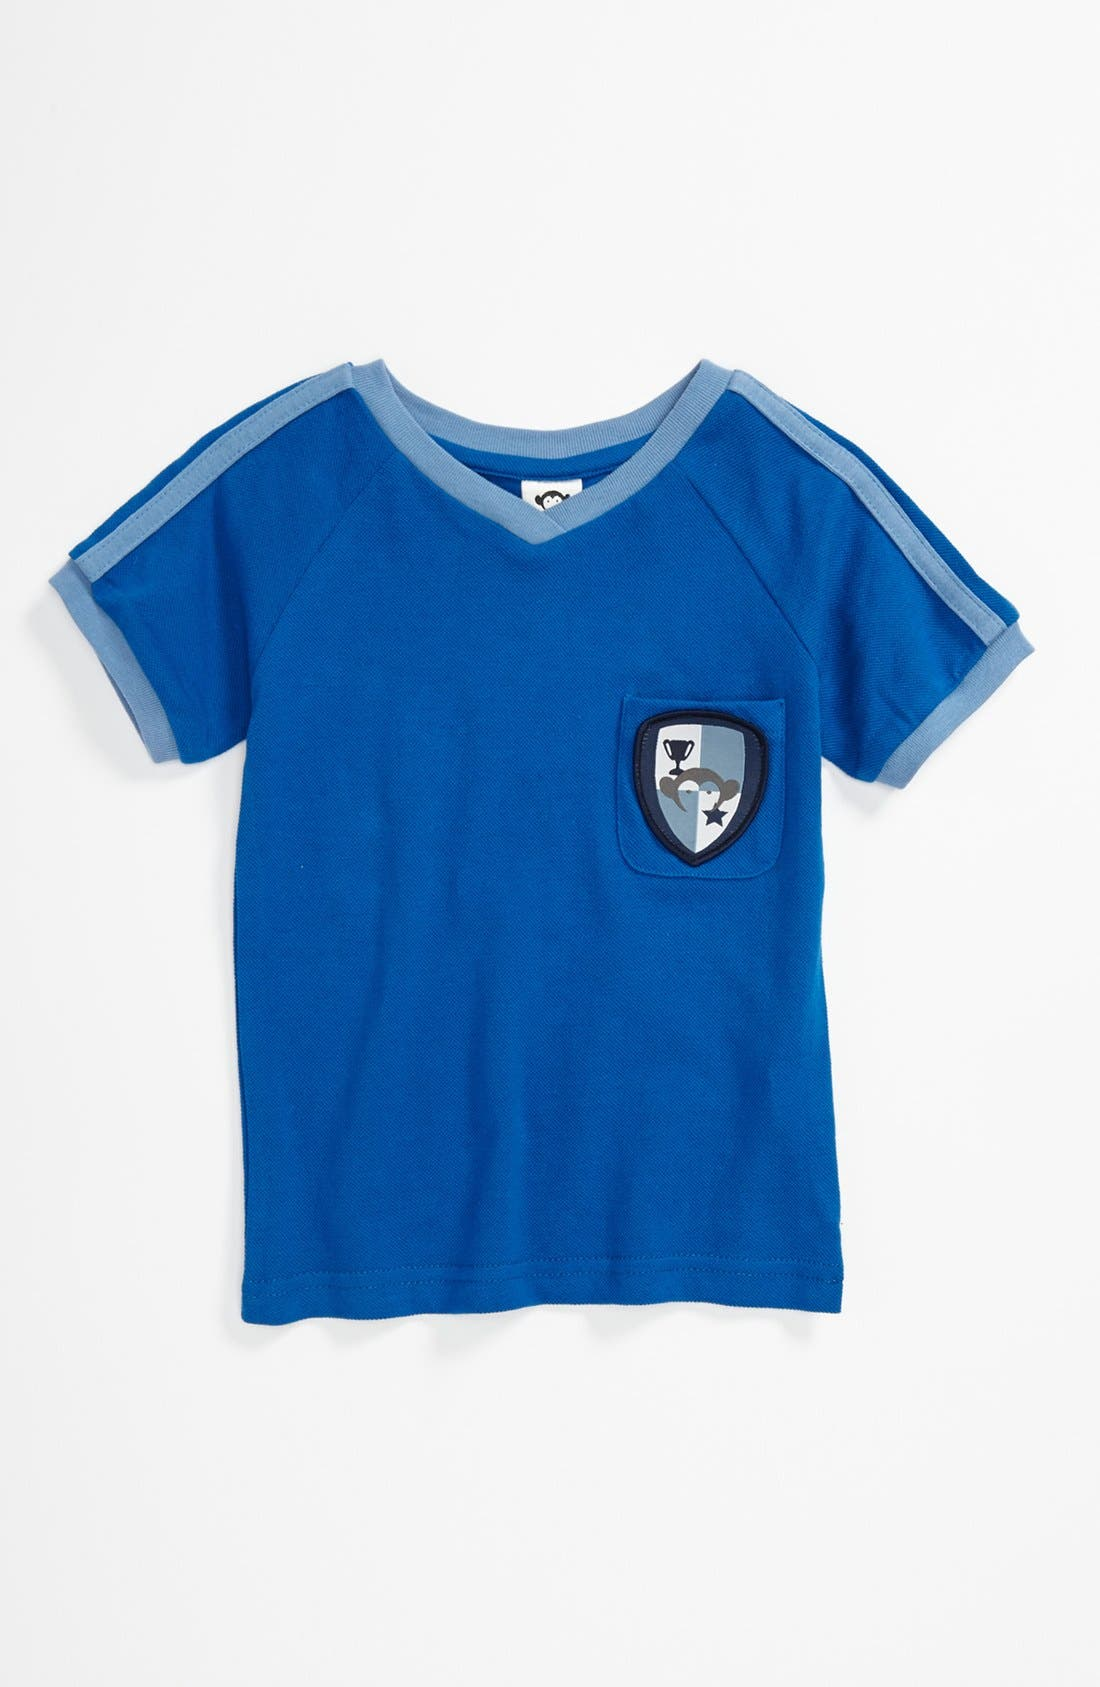 Main Image - Appaman 'Soccer' T-Shirt (Toddler)